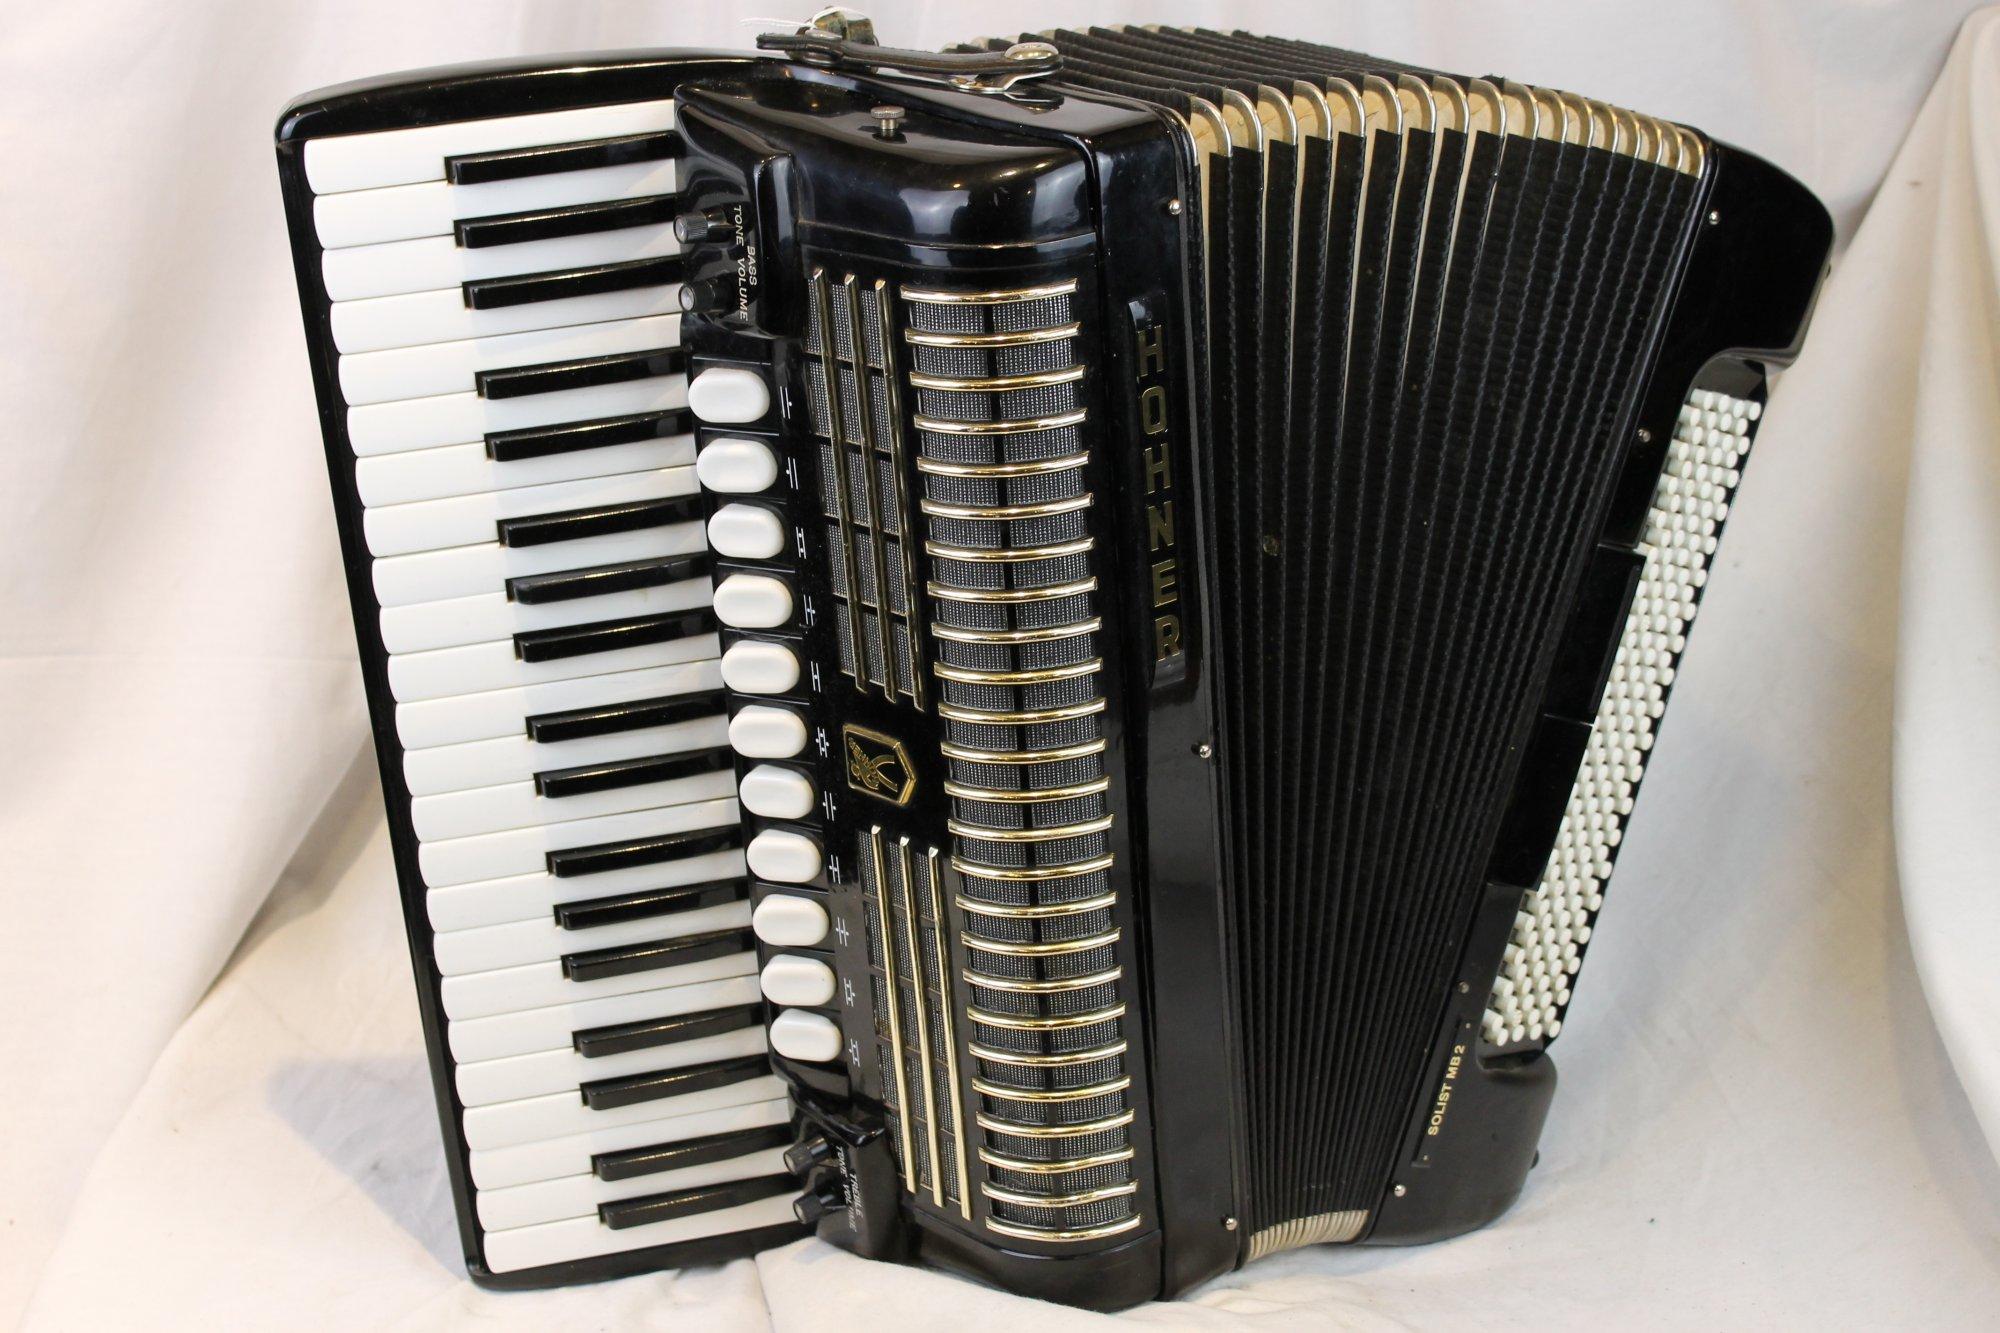 2891 - Black Hohner Solist Free Bass Piano Accordion LMMH